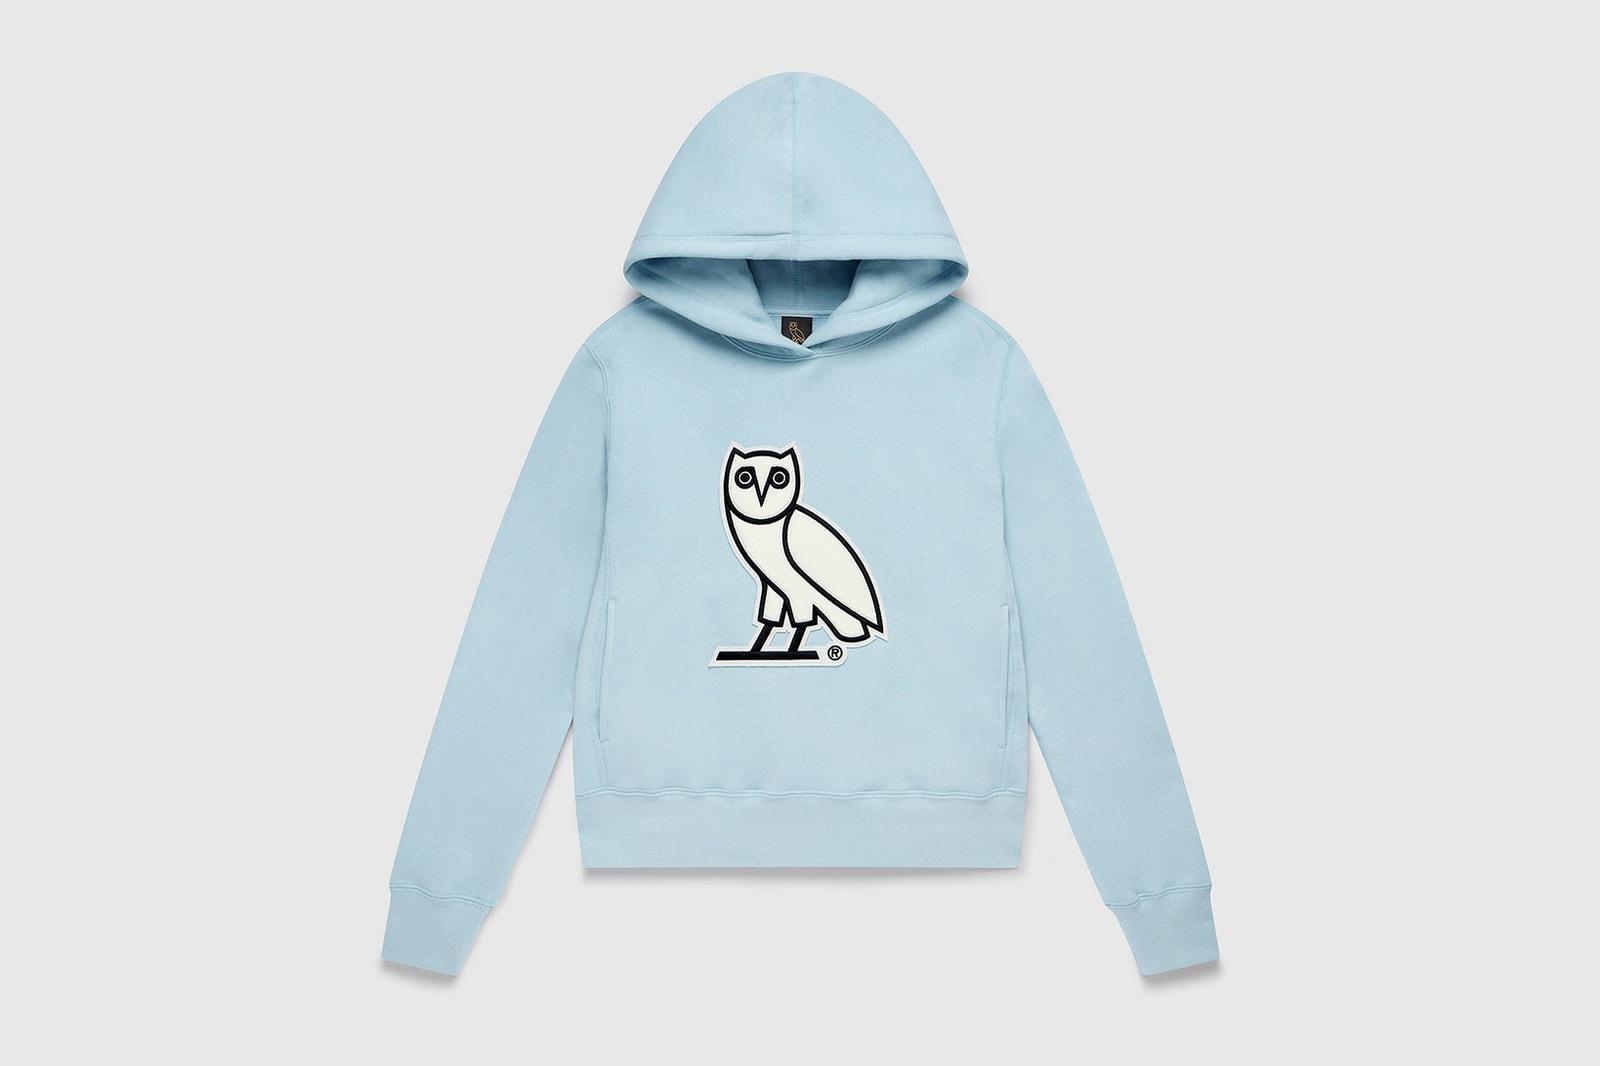 ovo octobers very own drake womenswear line launch sofia richie fall winter hoodies sweatshirts loungewear pajamas